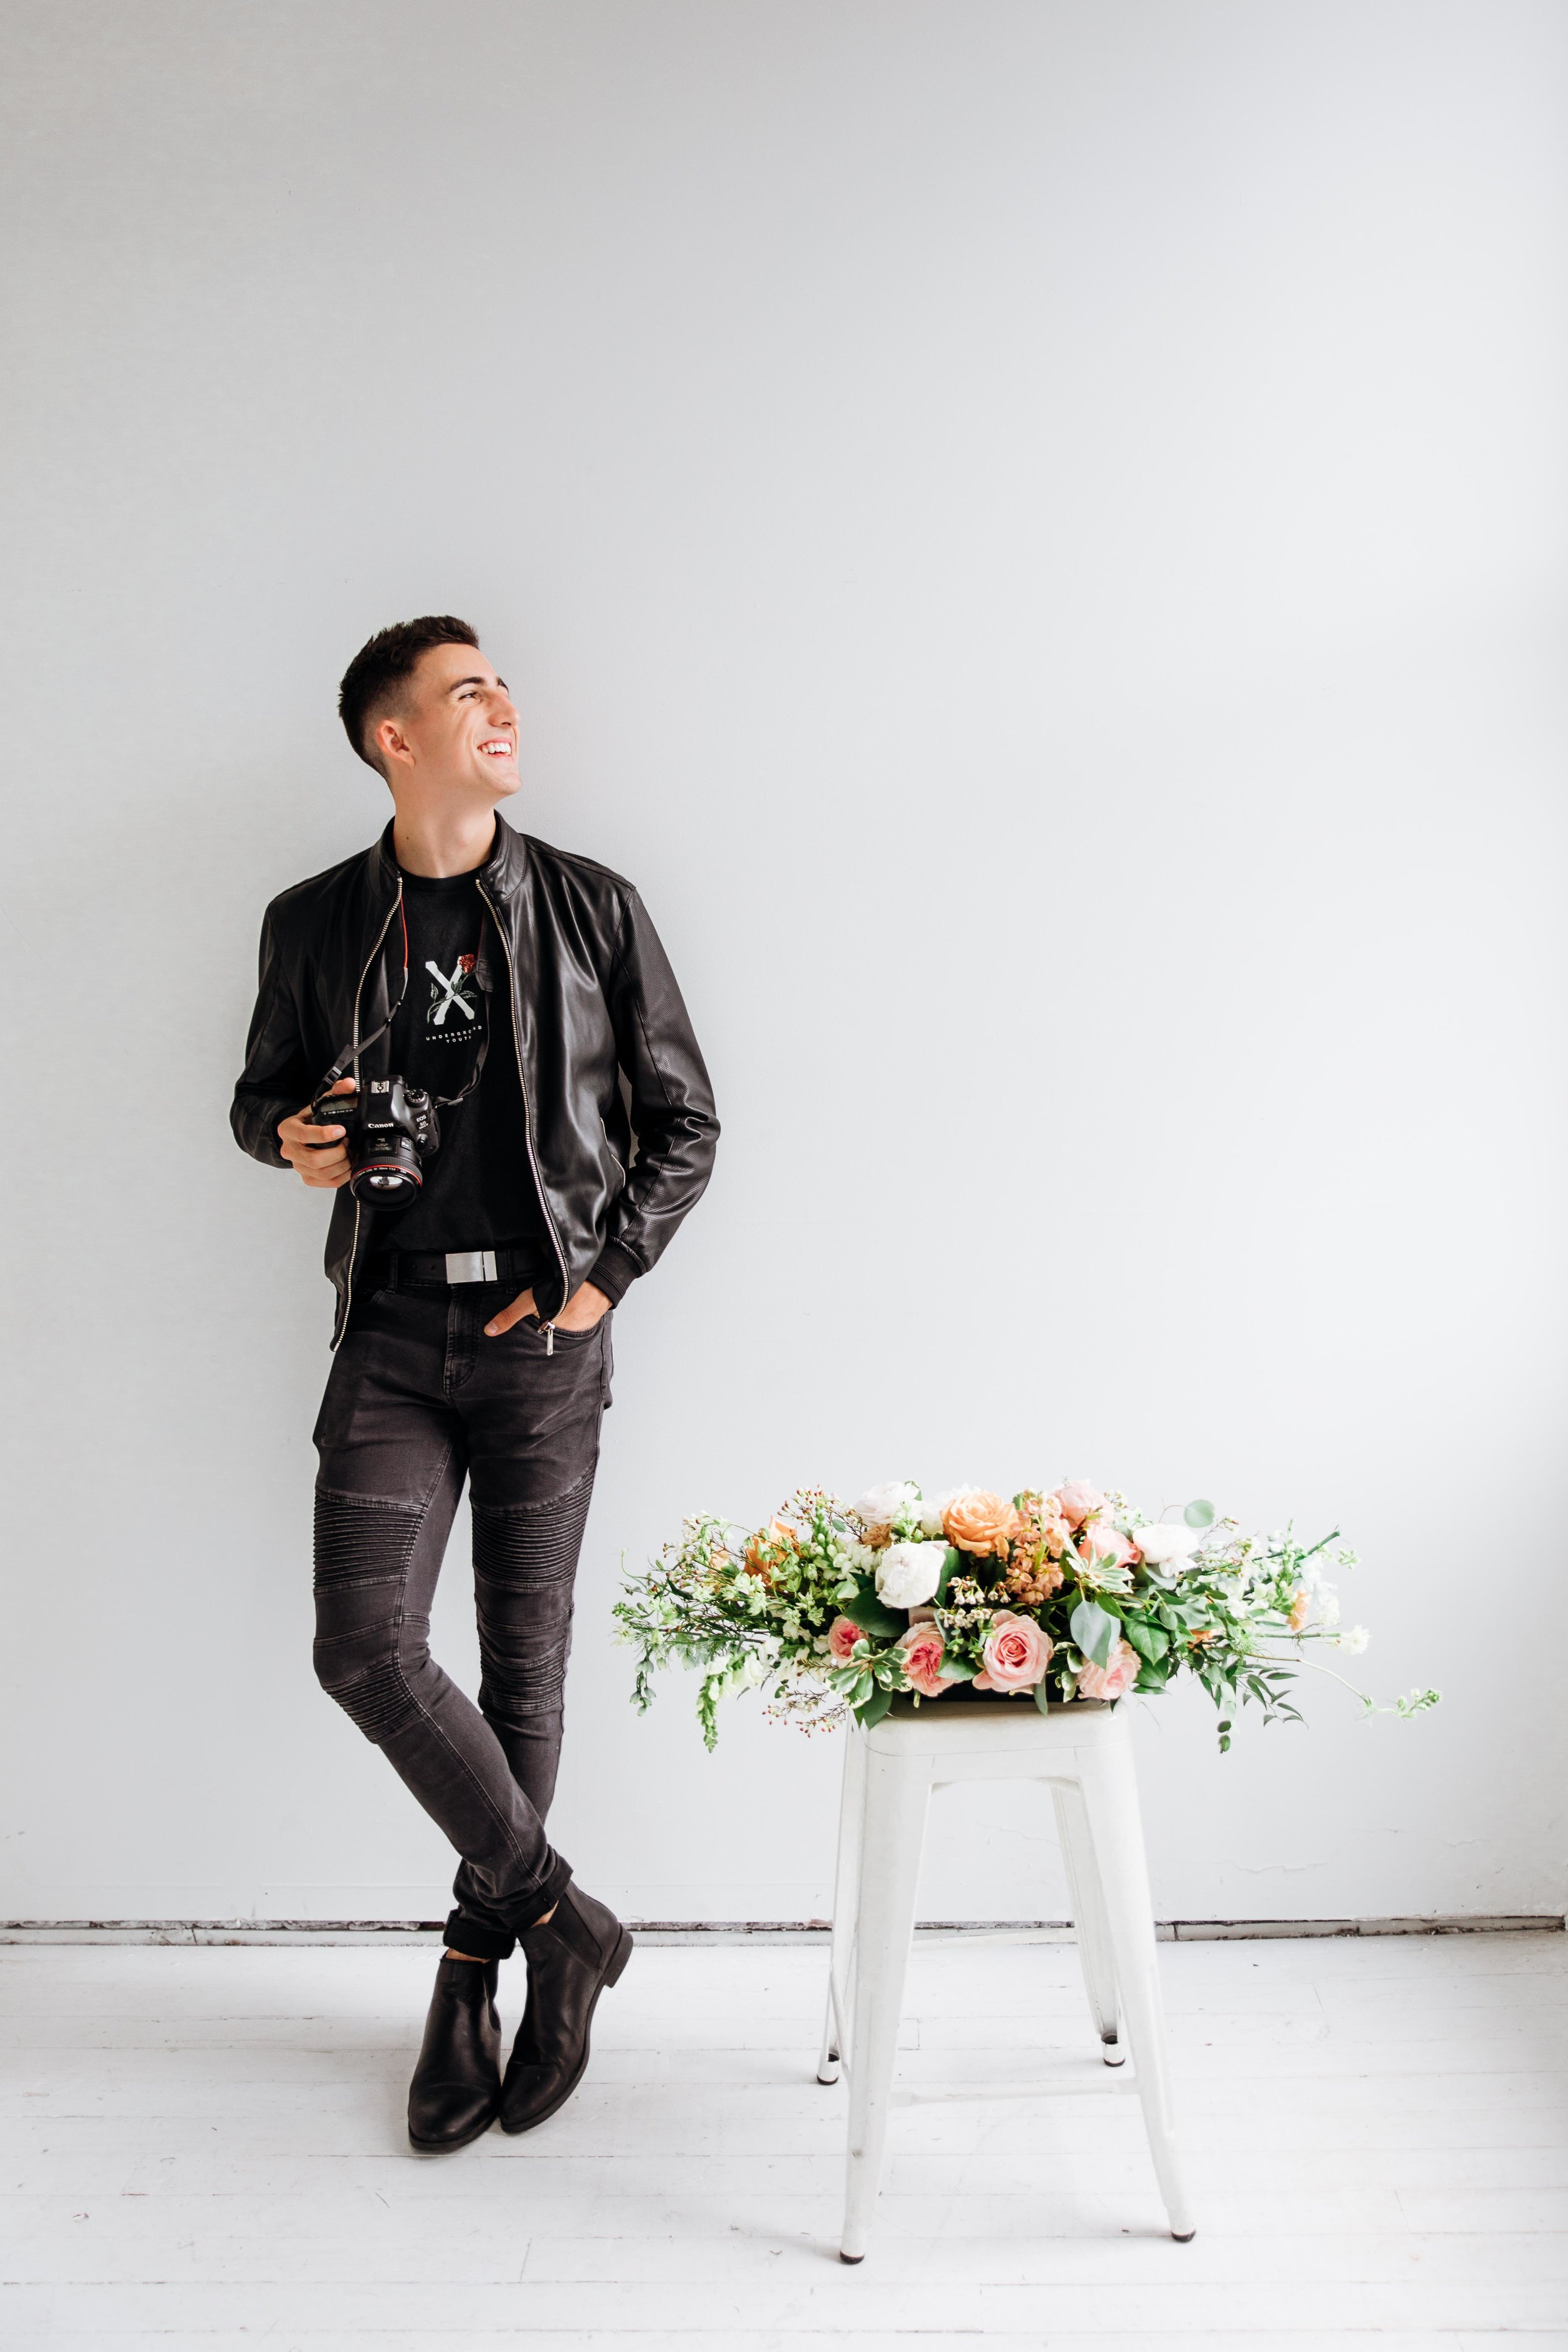 utah-and-worldwide-destination-wedding-photographer-and-videographer-michael-cozzens-2.jpg